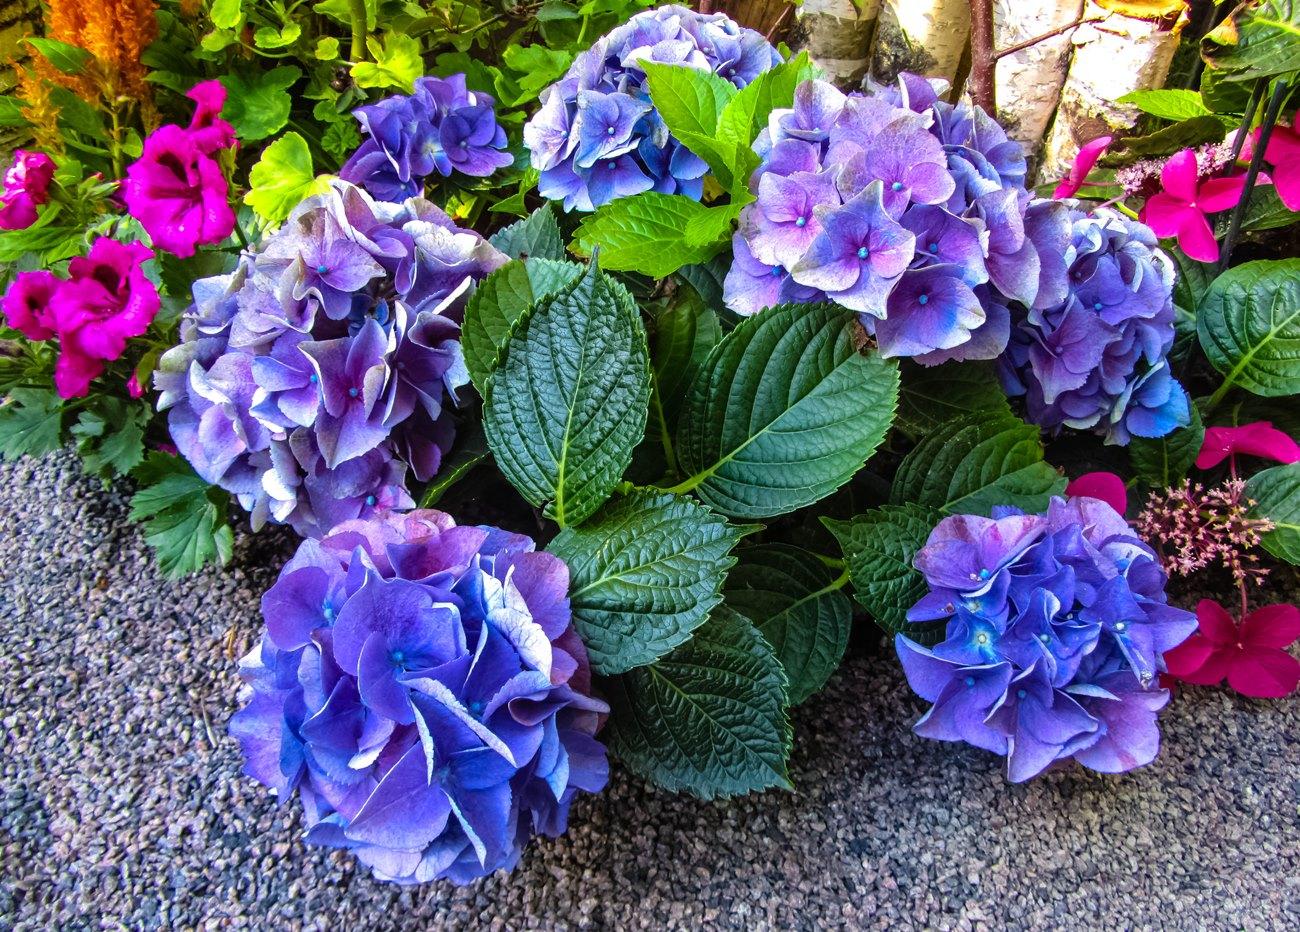 irina-fortuna-moscow-flowers 02.jpg